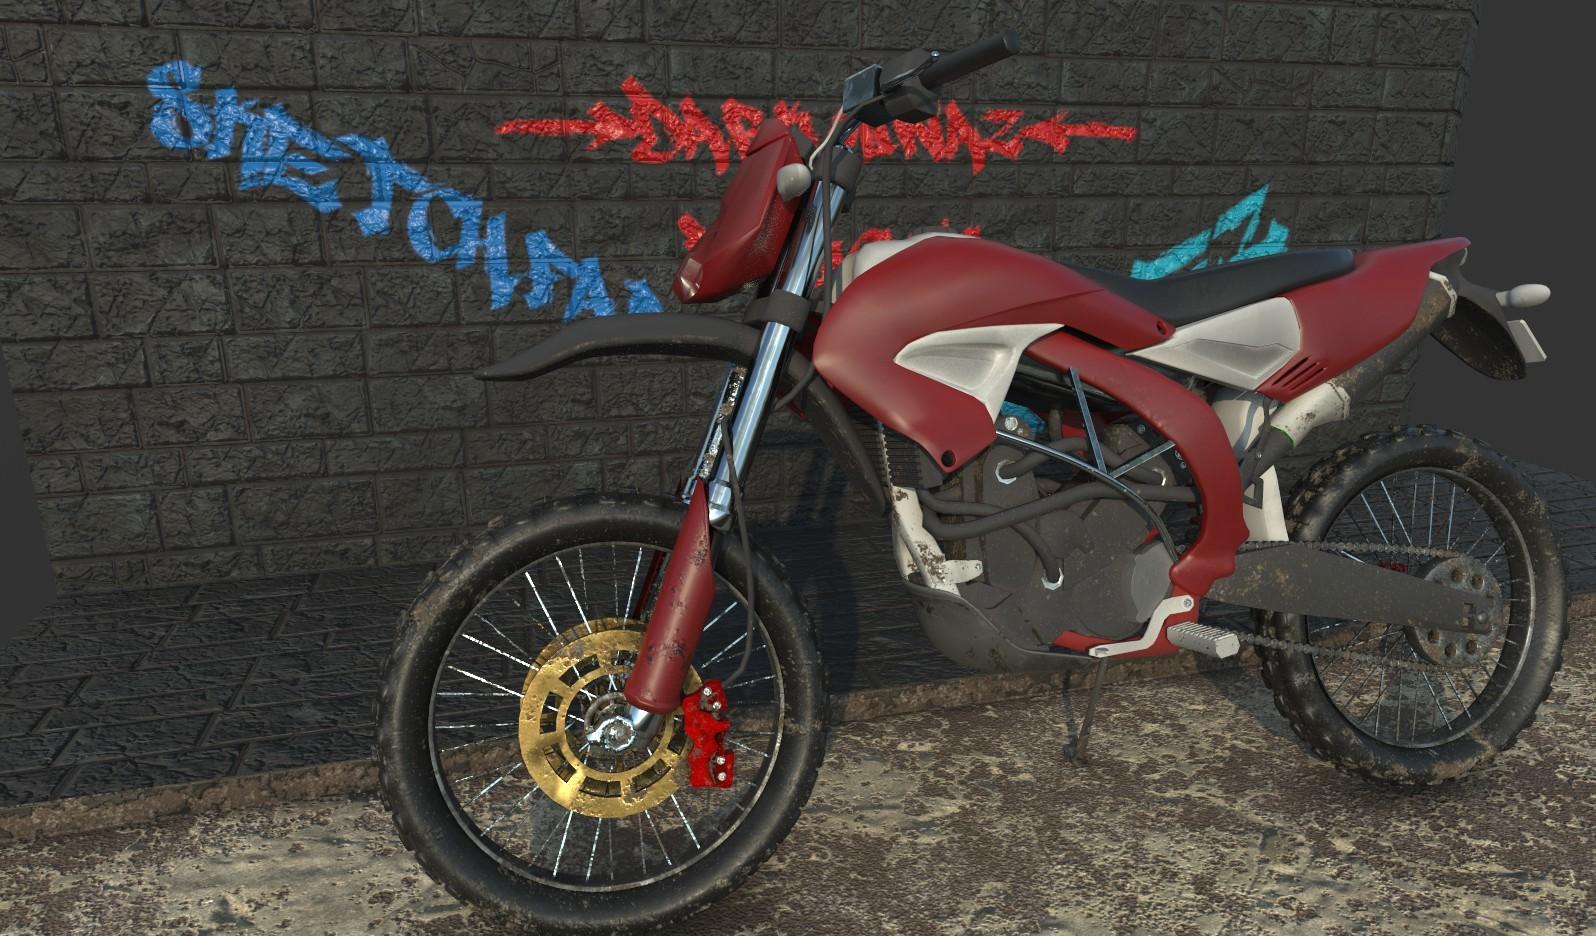 Vray on updated Motorbike